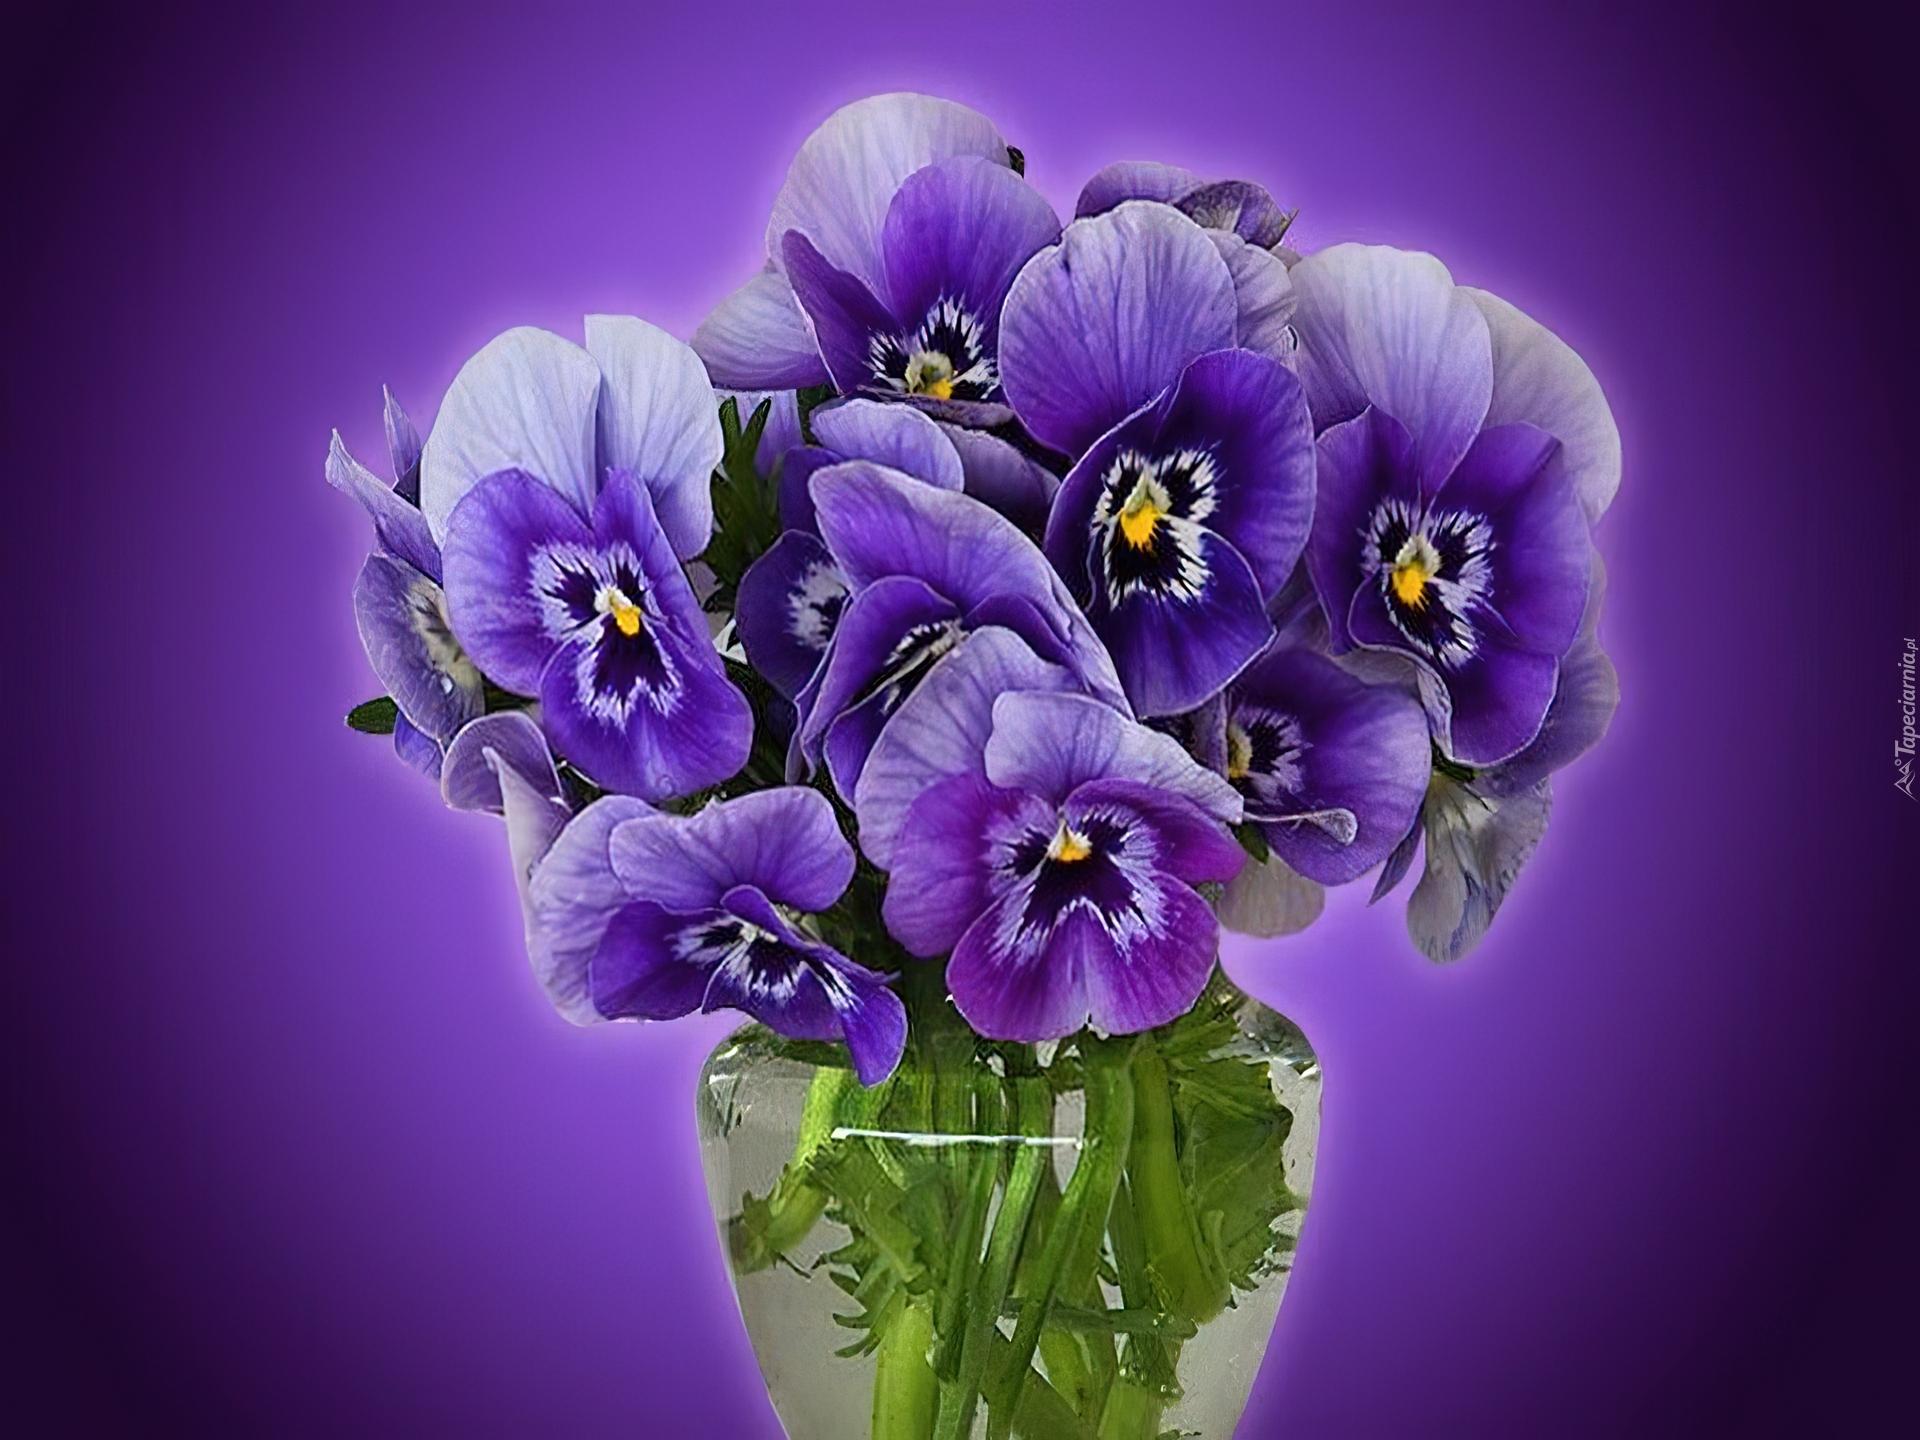 Заповедник, цветы для анечки открытка